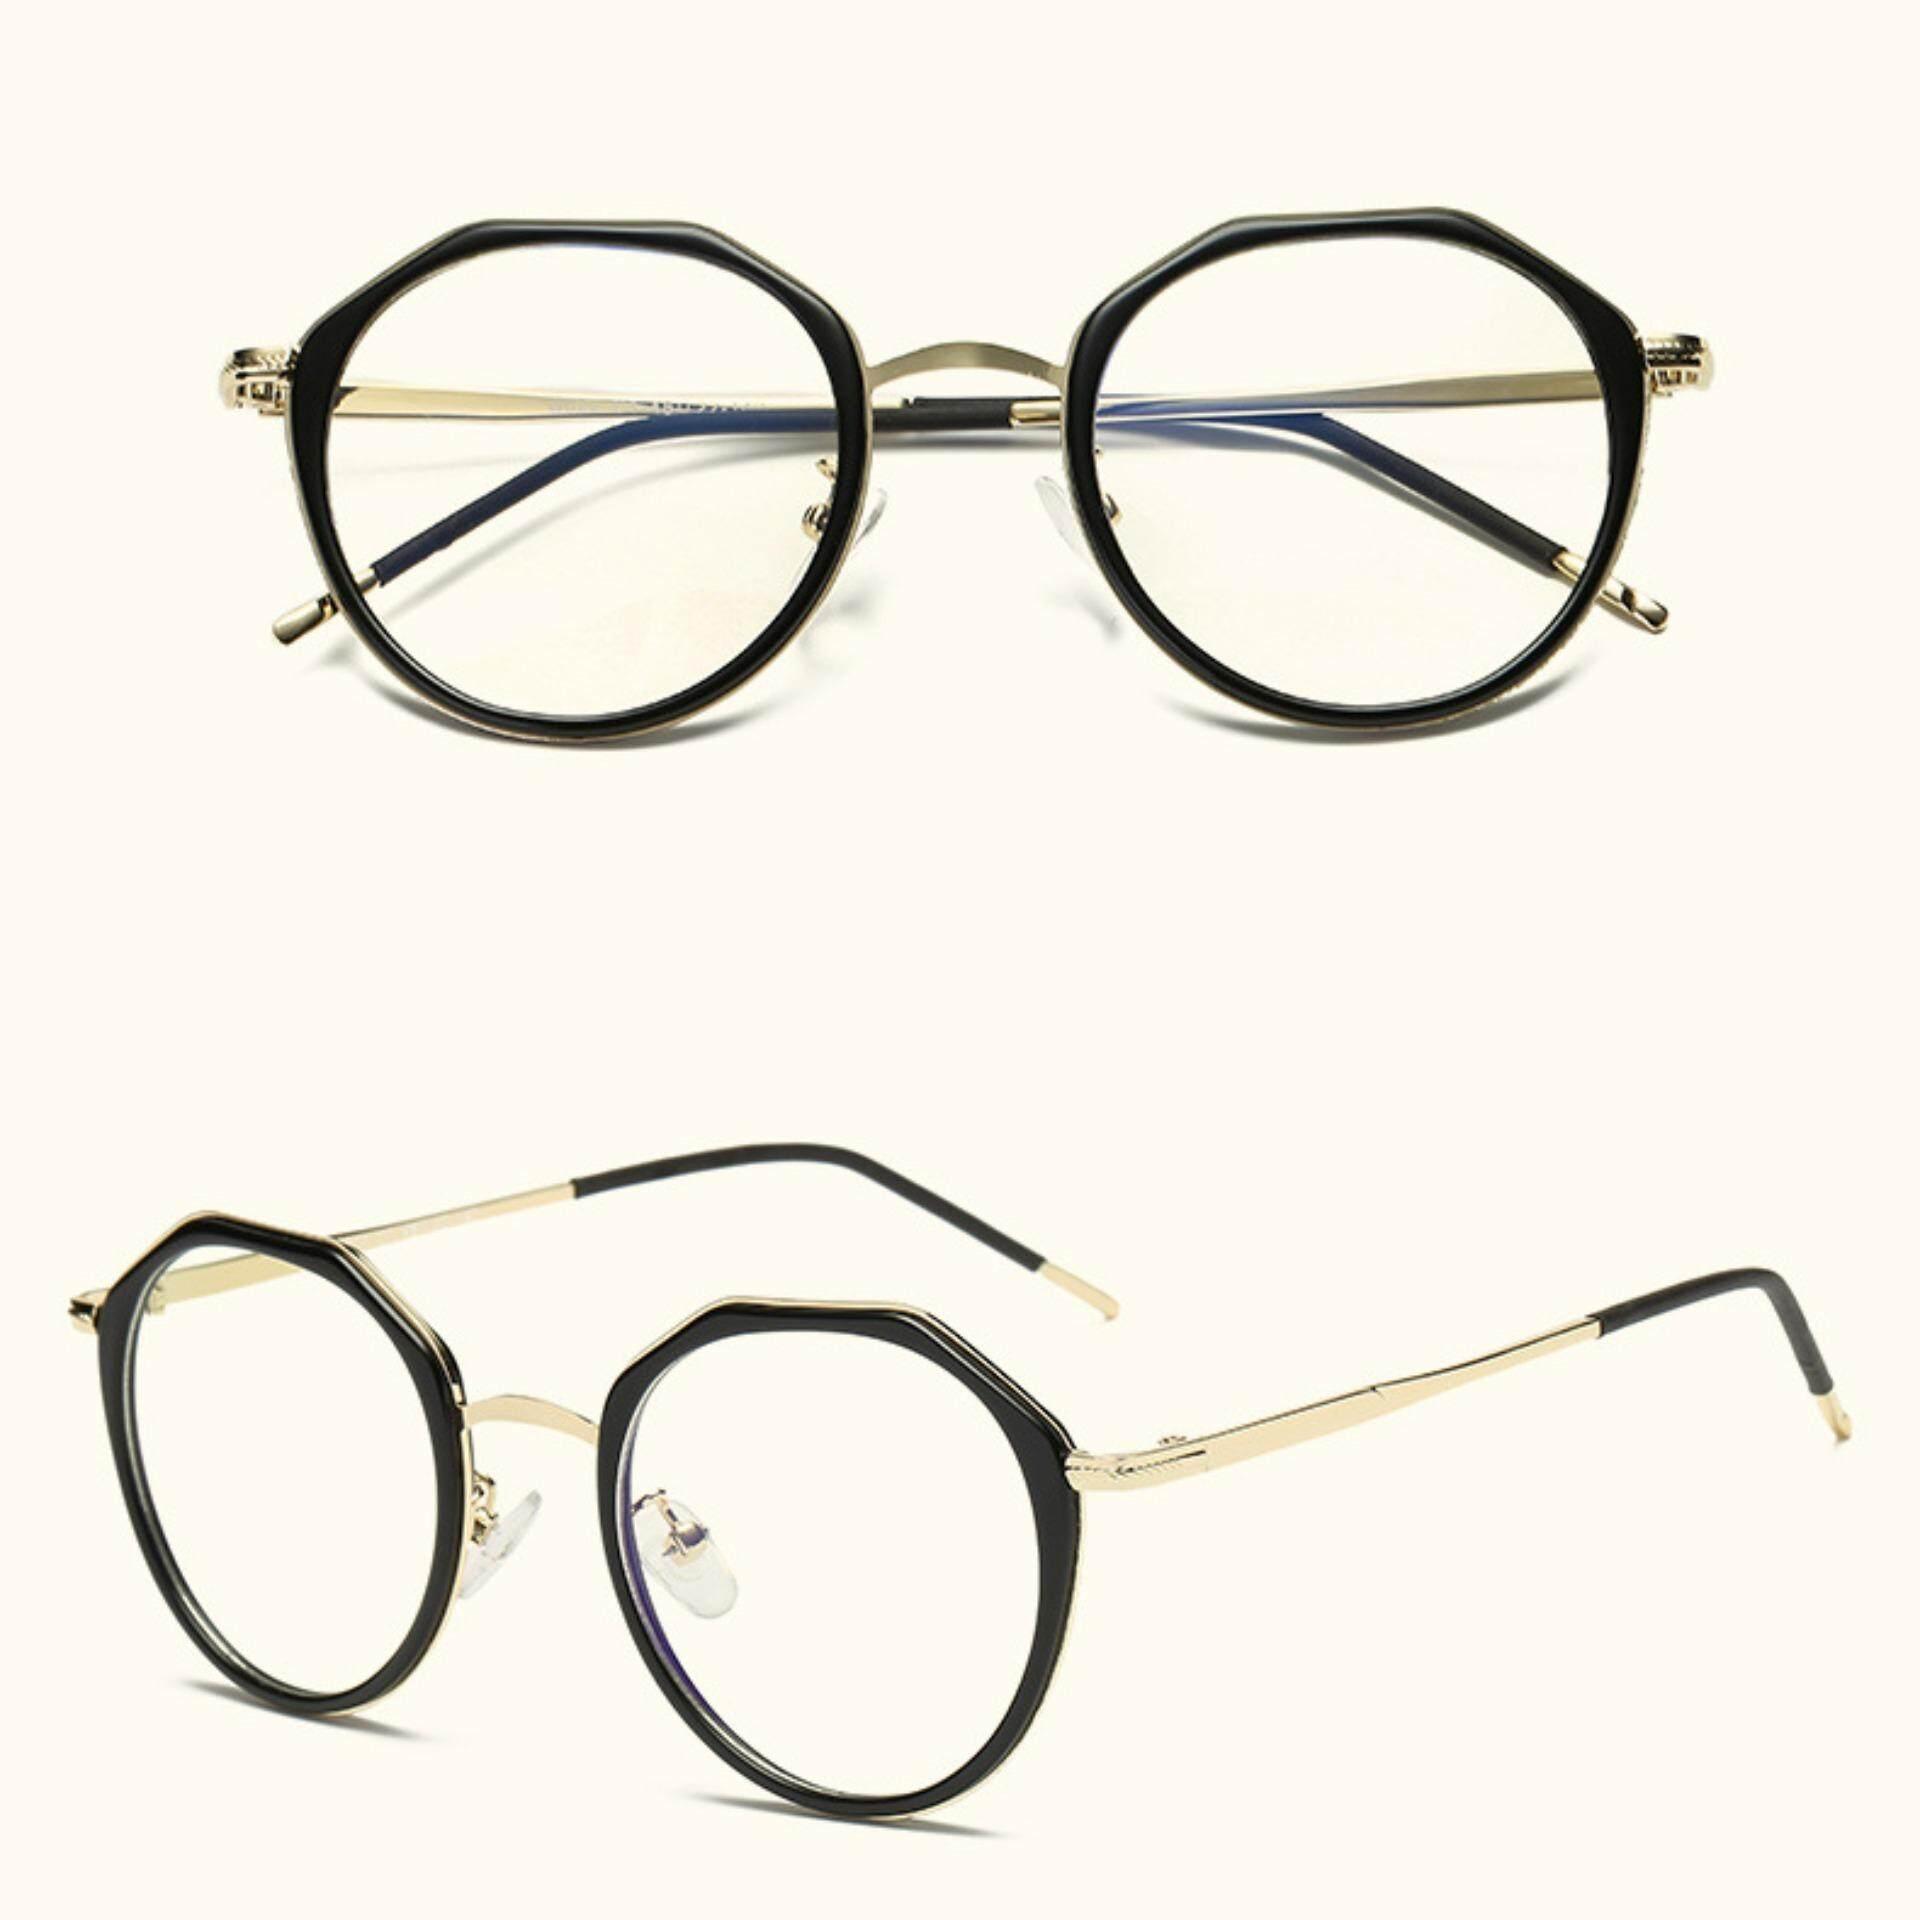 b2100d58db Computer Gaming Glasses Anti Blue Light Anti Reflective Anti Glare Anti Eye  Strain Lens 100%